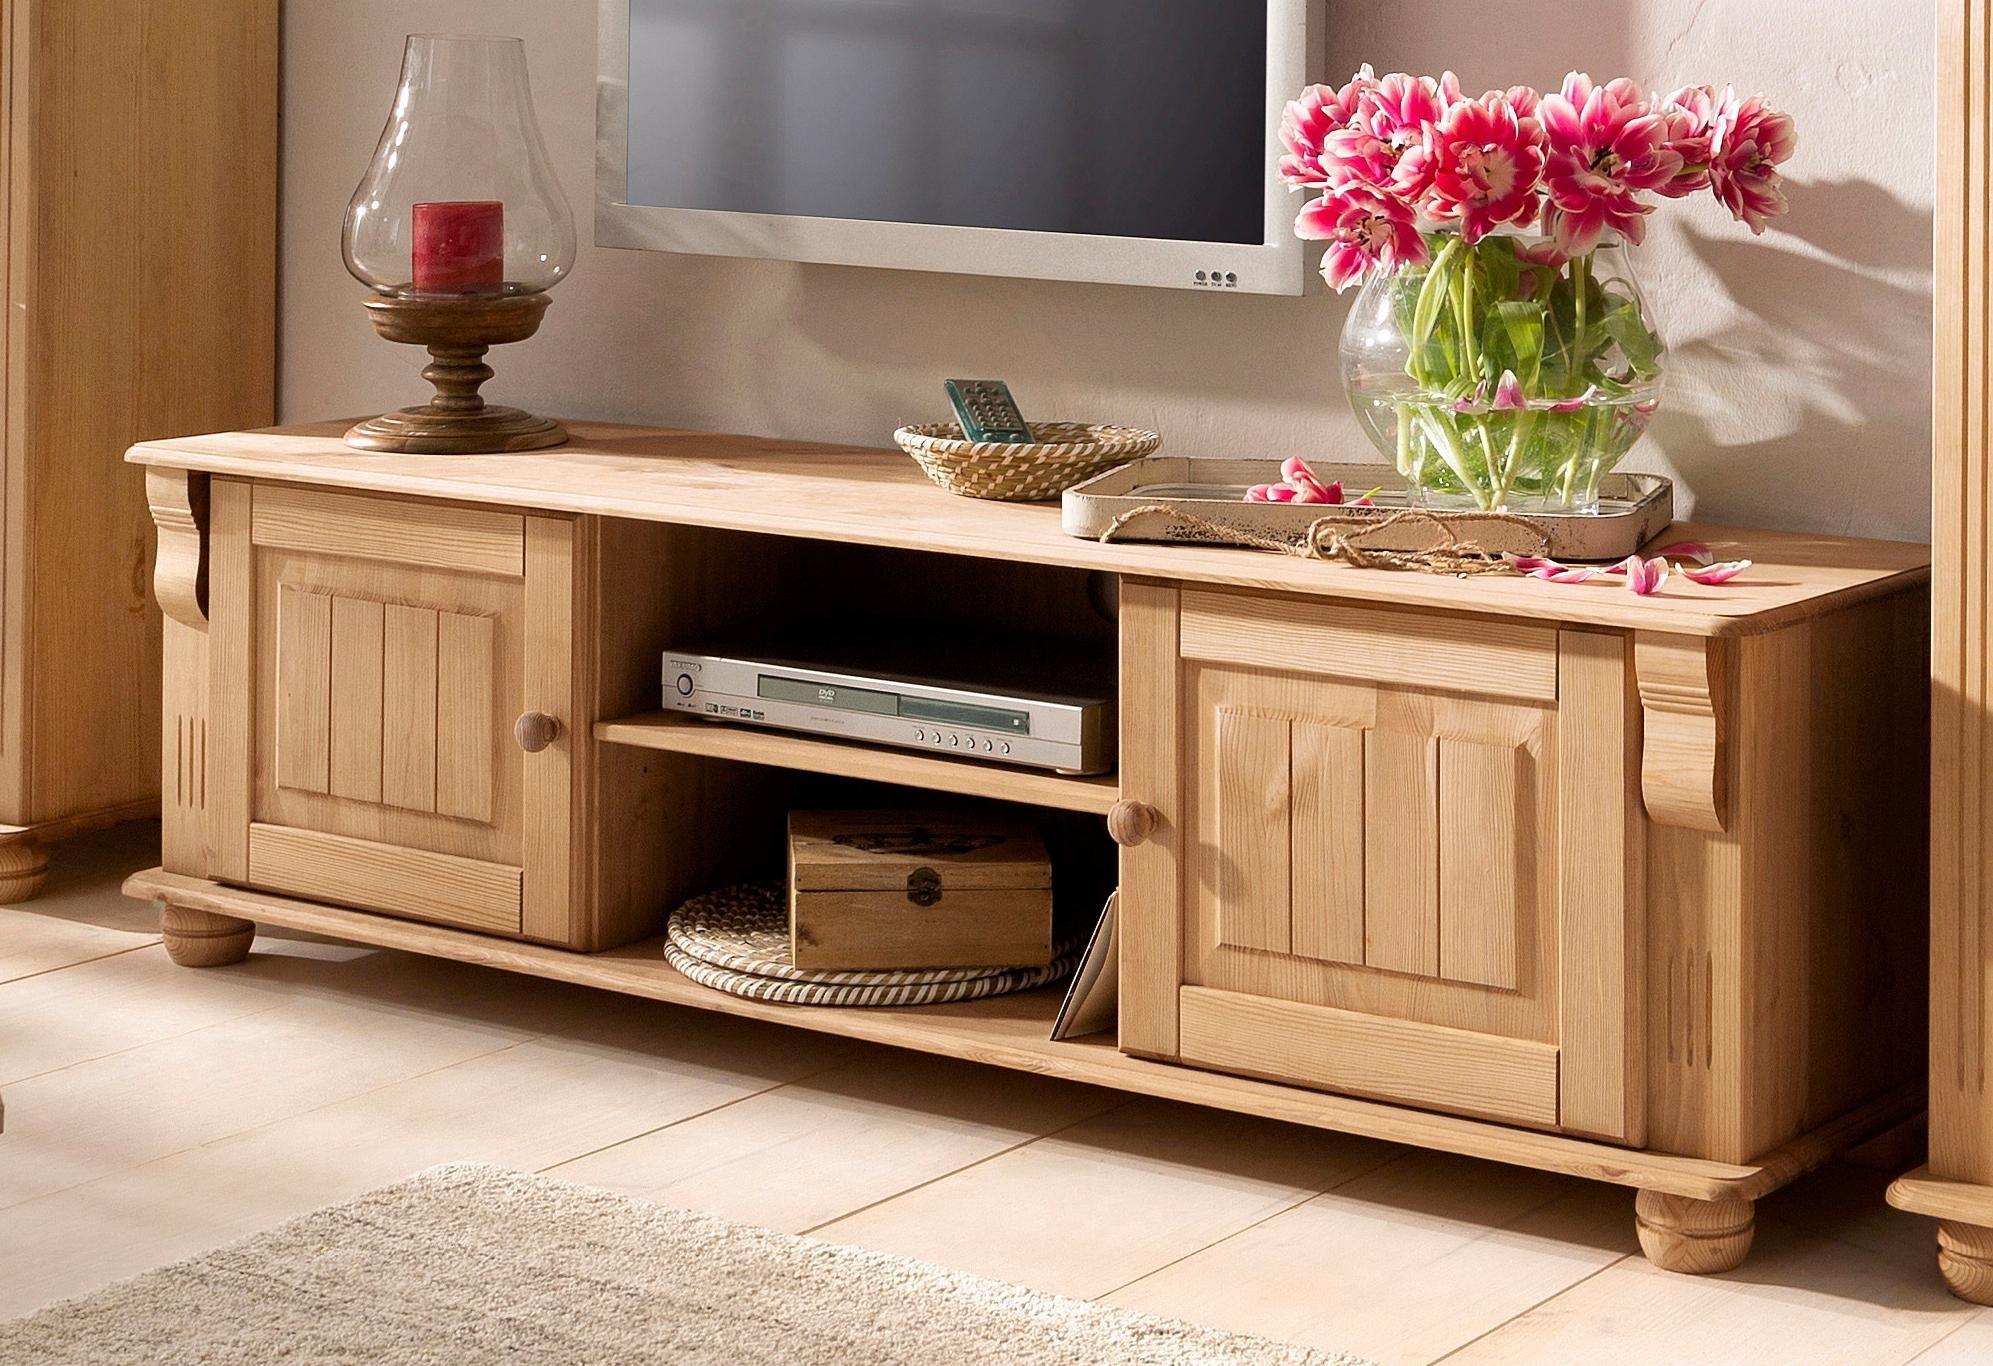 Home Affaire lowboard »Adele«, breedte 160 cm online kopen op otto.nl